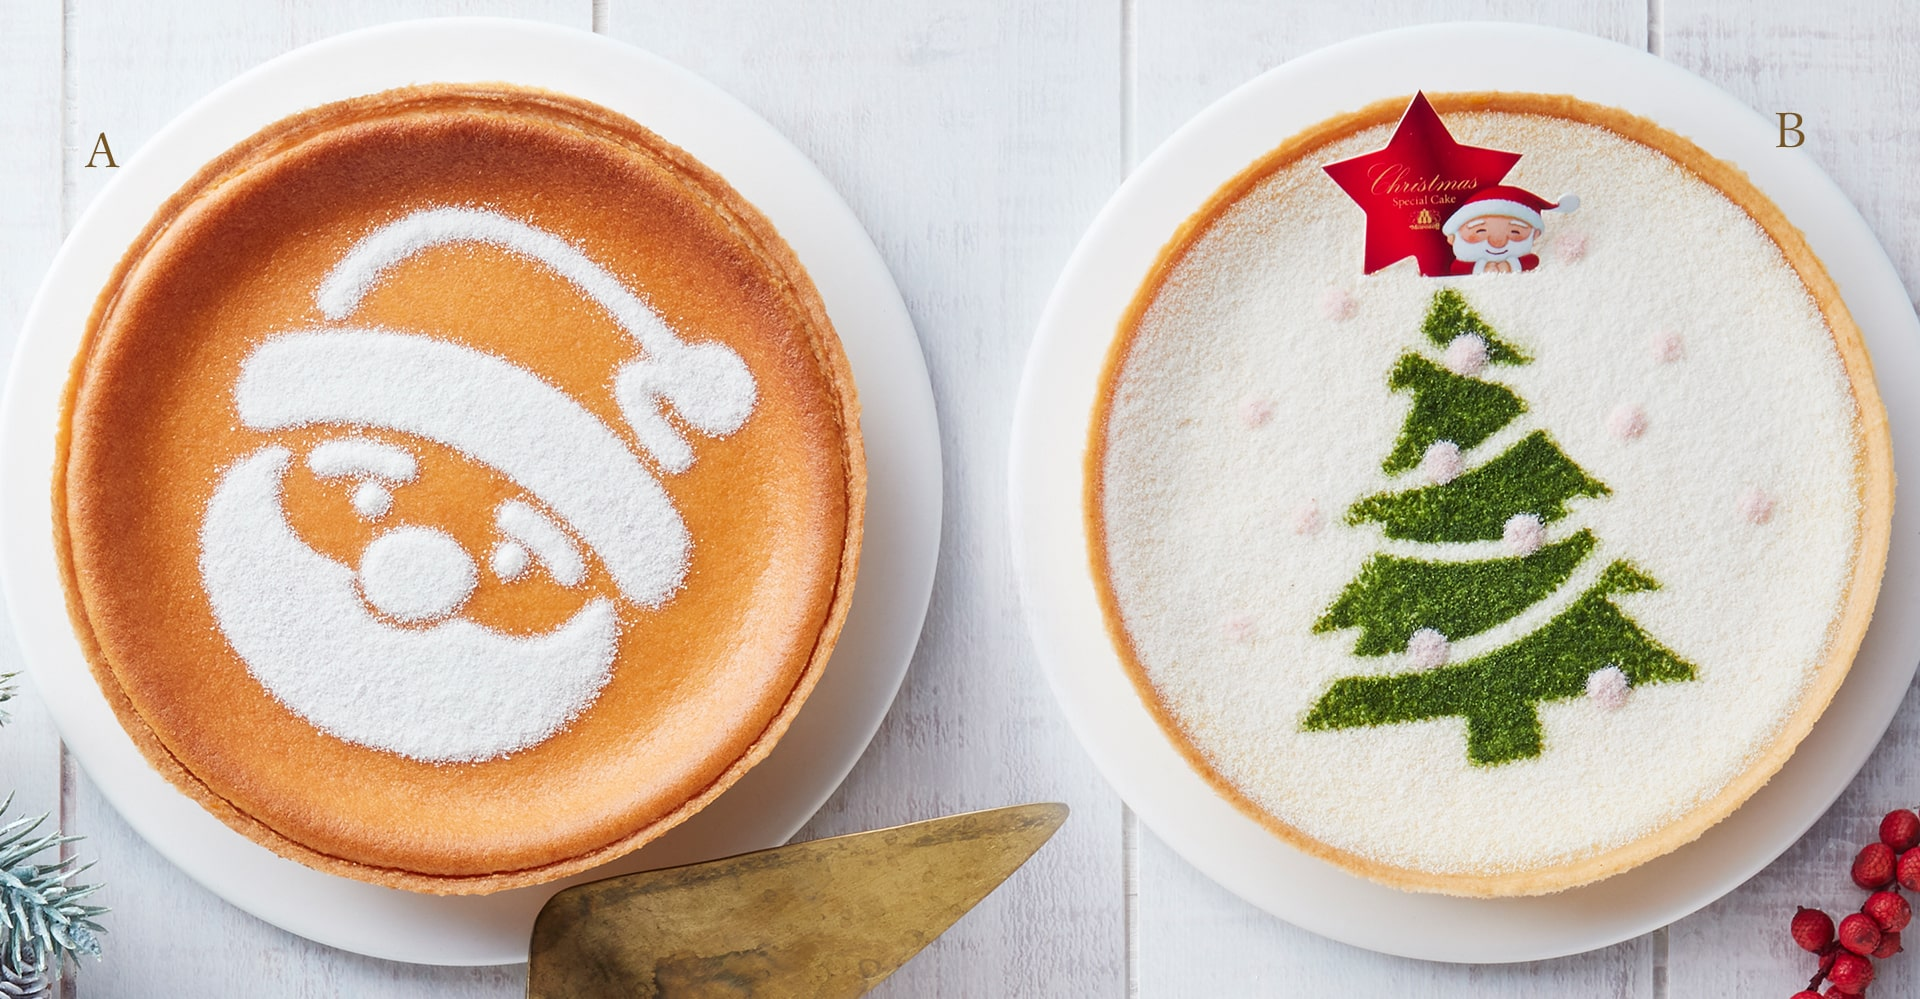 CHRISTMAS MASCARPONE CHEESE CAKE CHRISTMAS DENMARK CREAM CHEESE CAKE